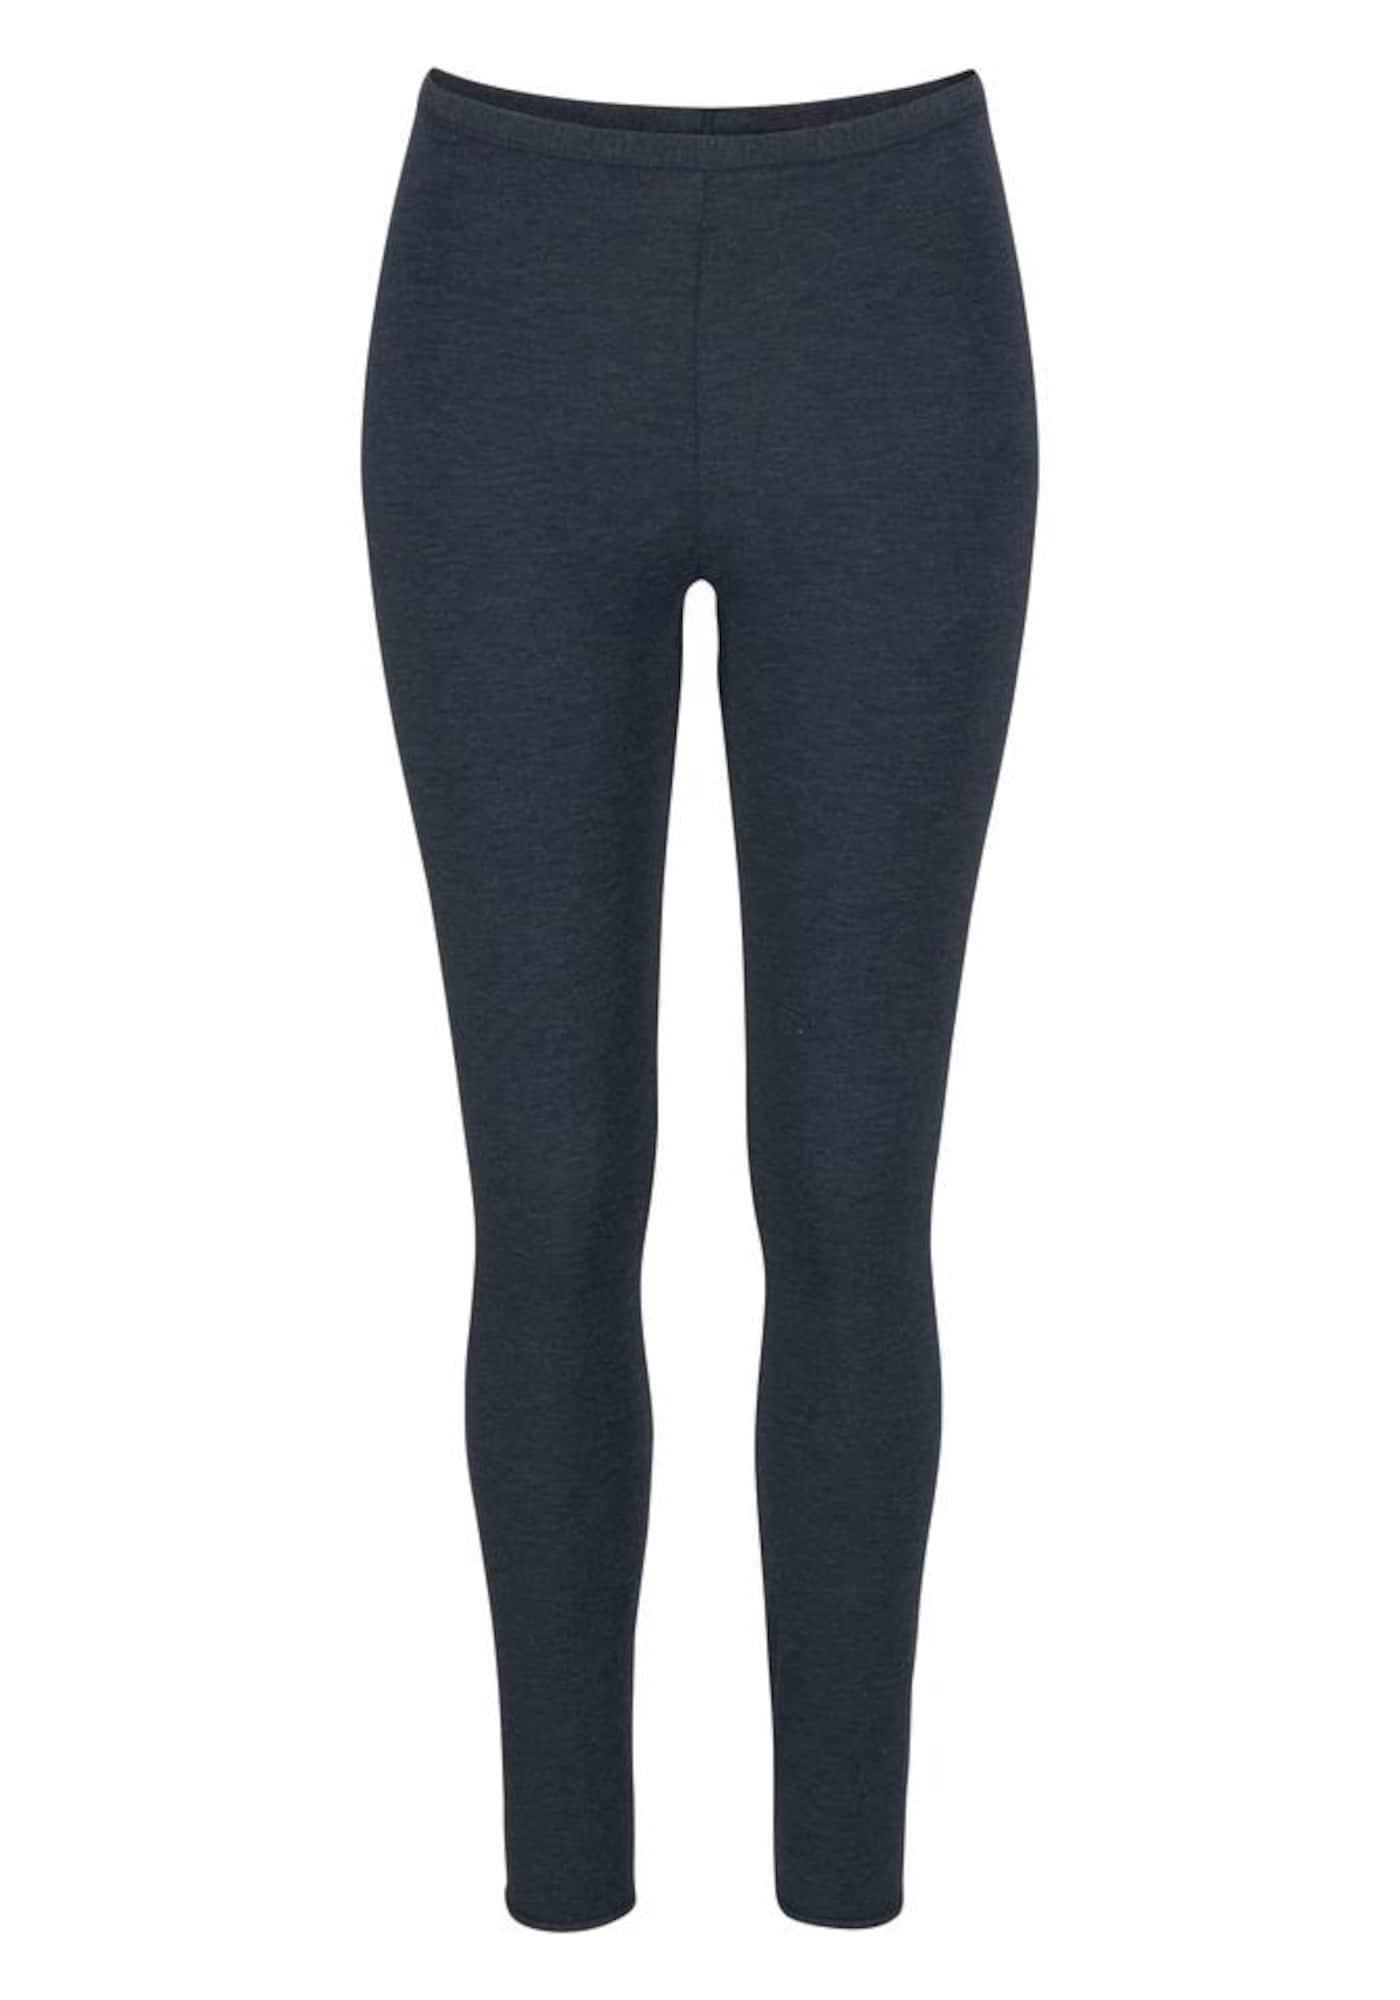 Pyžamové kalhoty Personal Fit tmavě modrá SCHIESSER